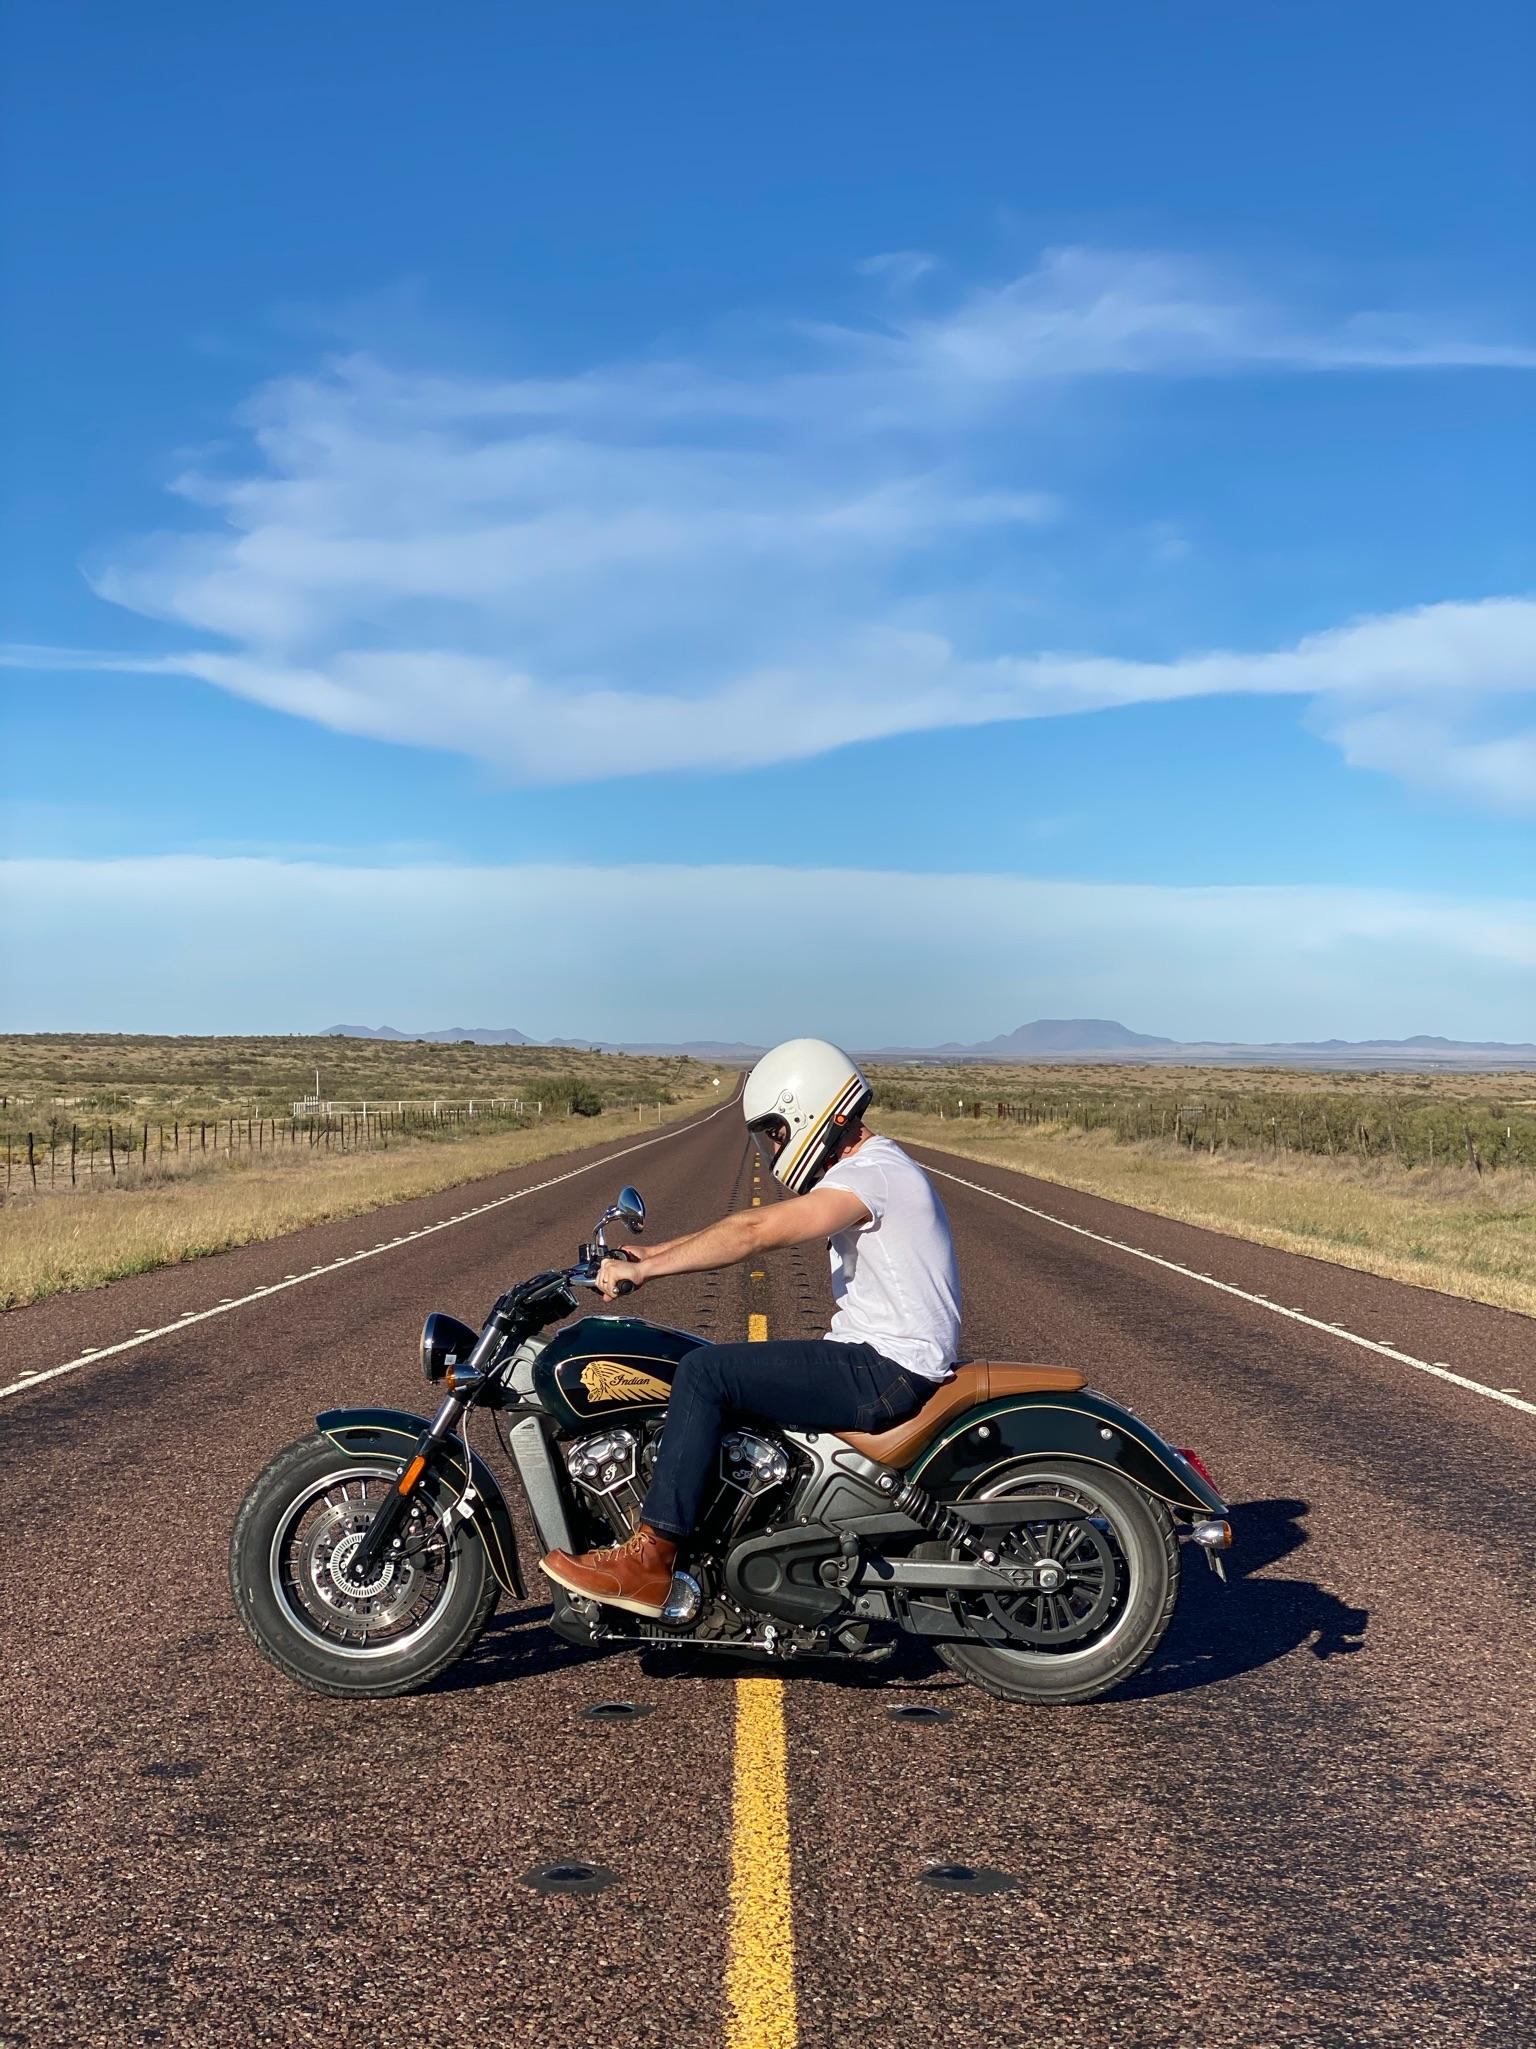 photo of man on motorcycle on highway in Texas desert